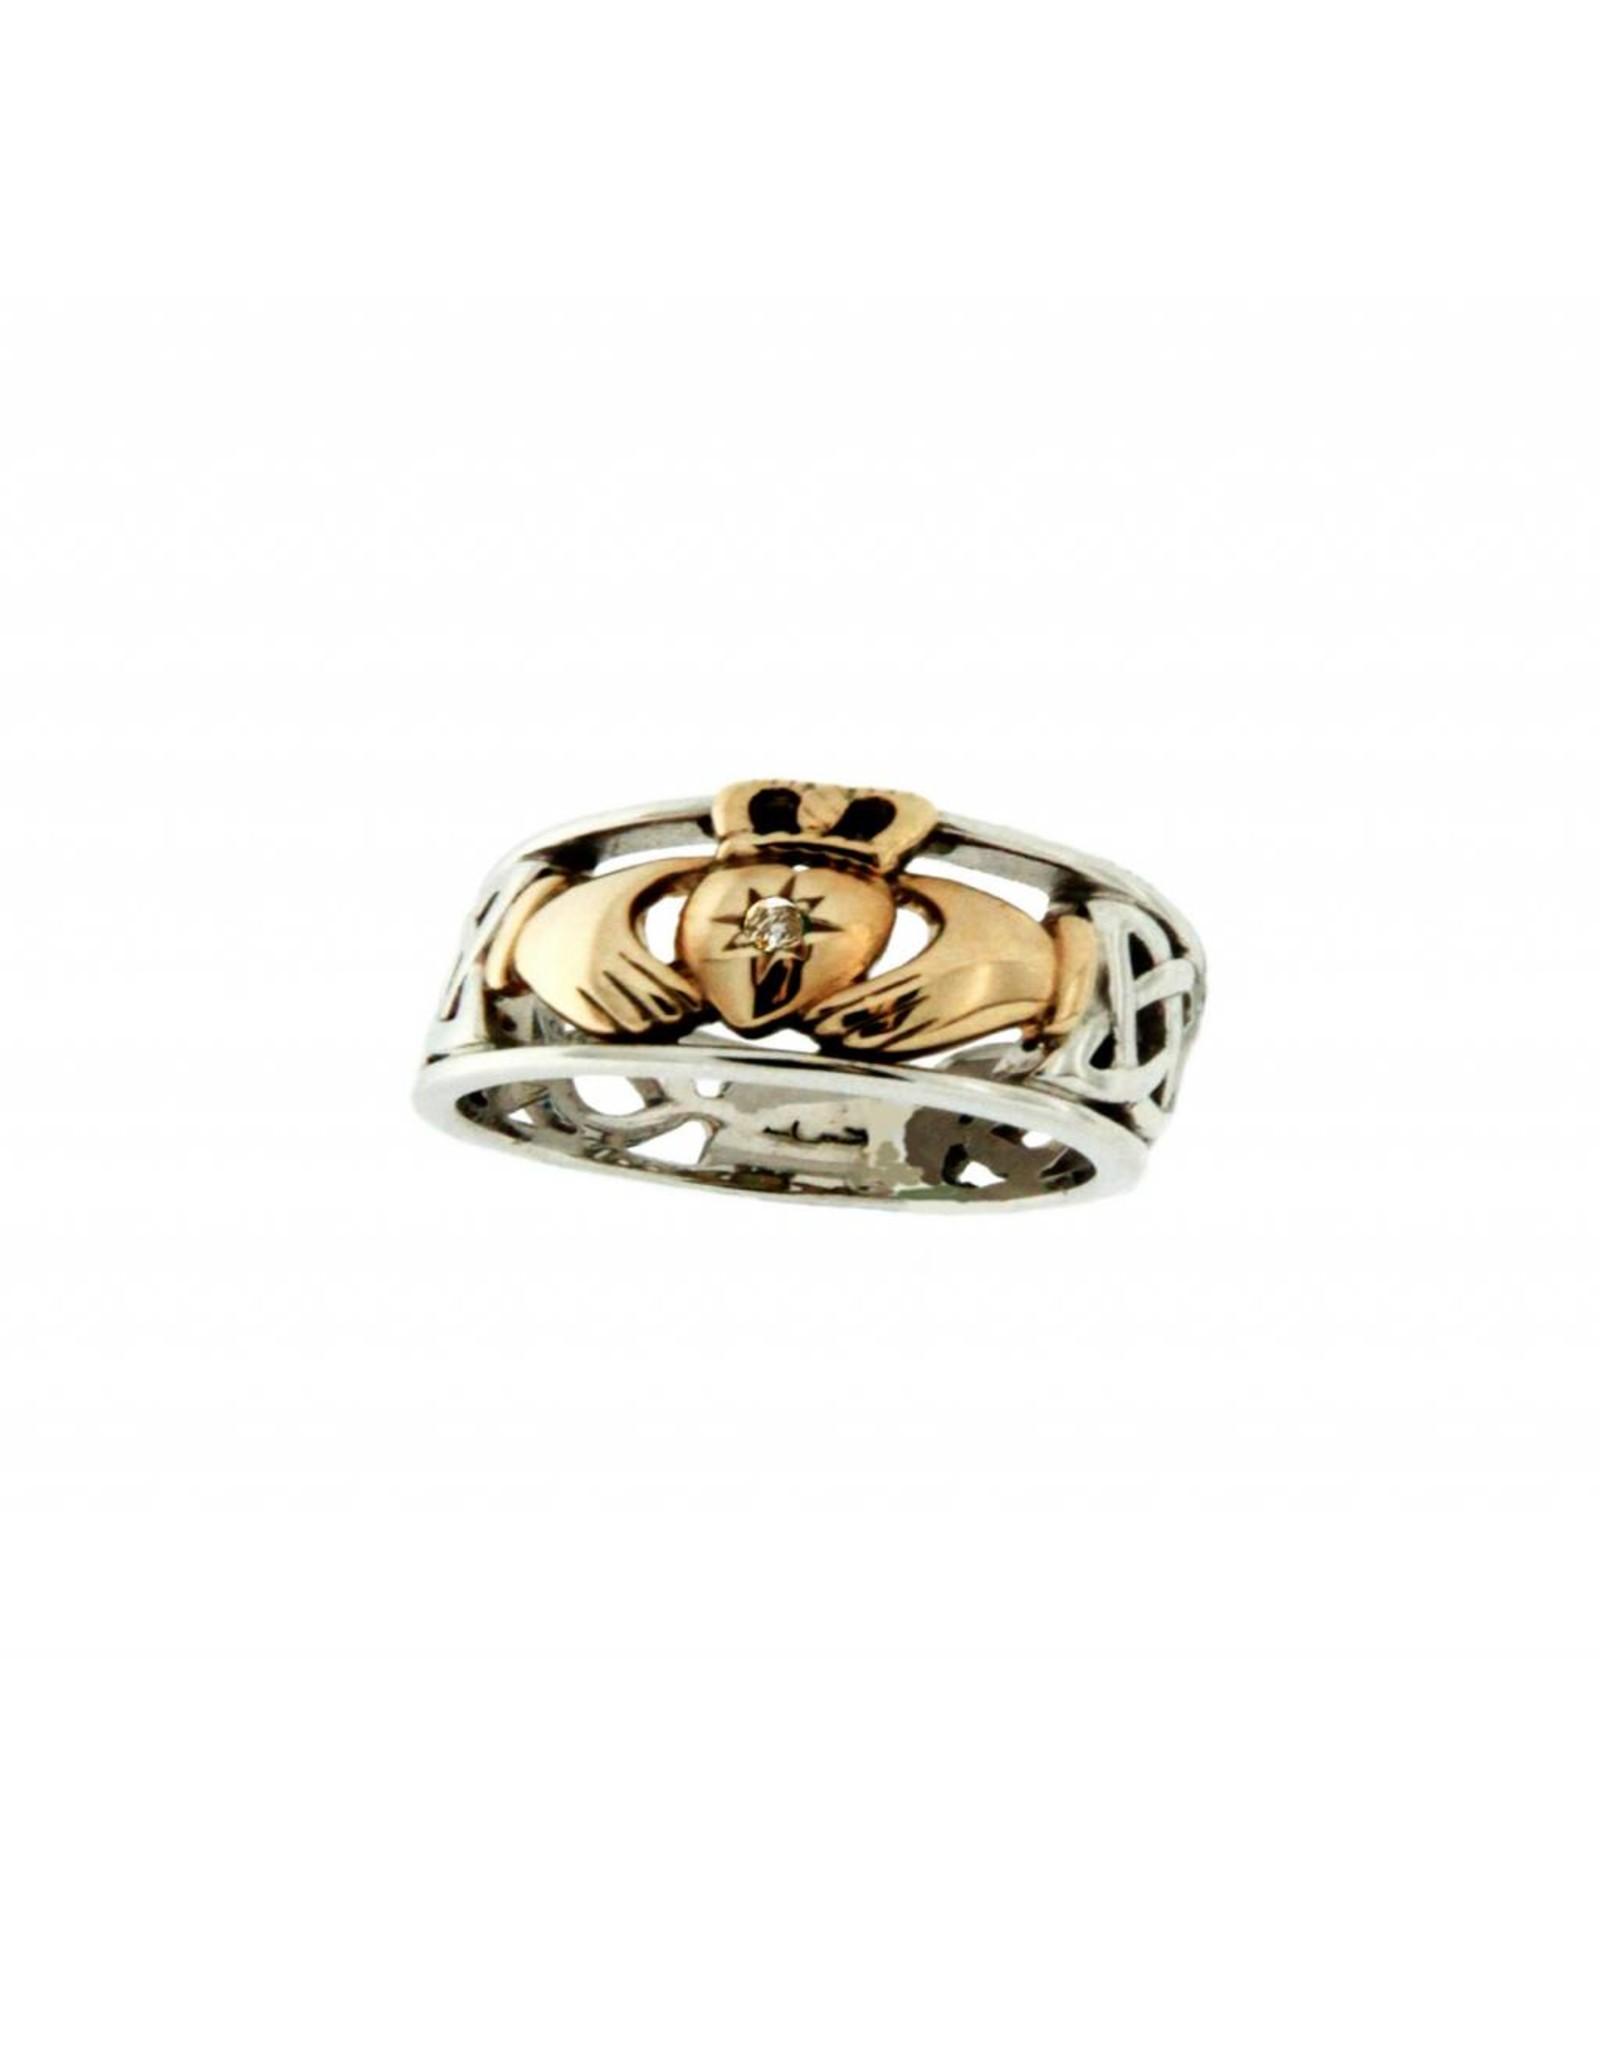 Keith Jack Silver / 10k Gold Claddagh w/ Diamond